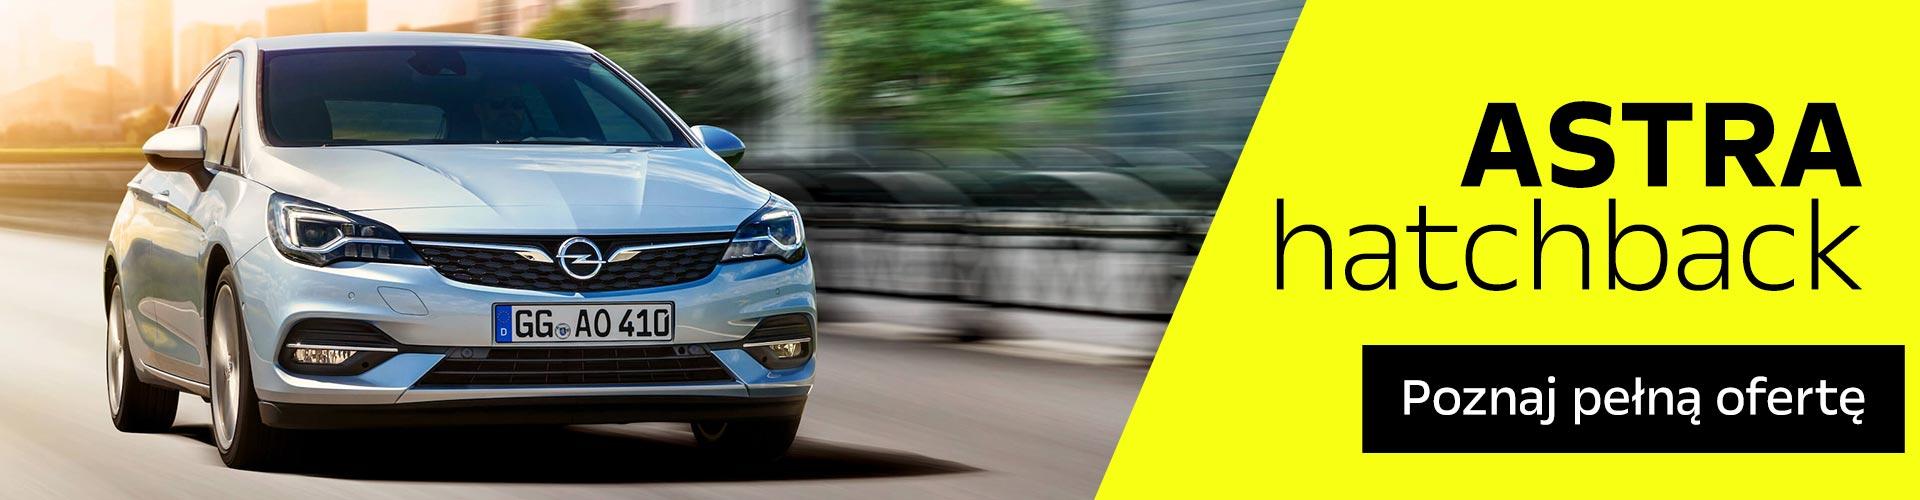 opel-2021-astra-hatchbackekonomiczny-silnik